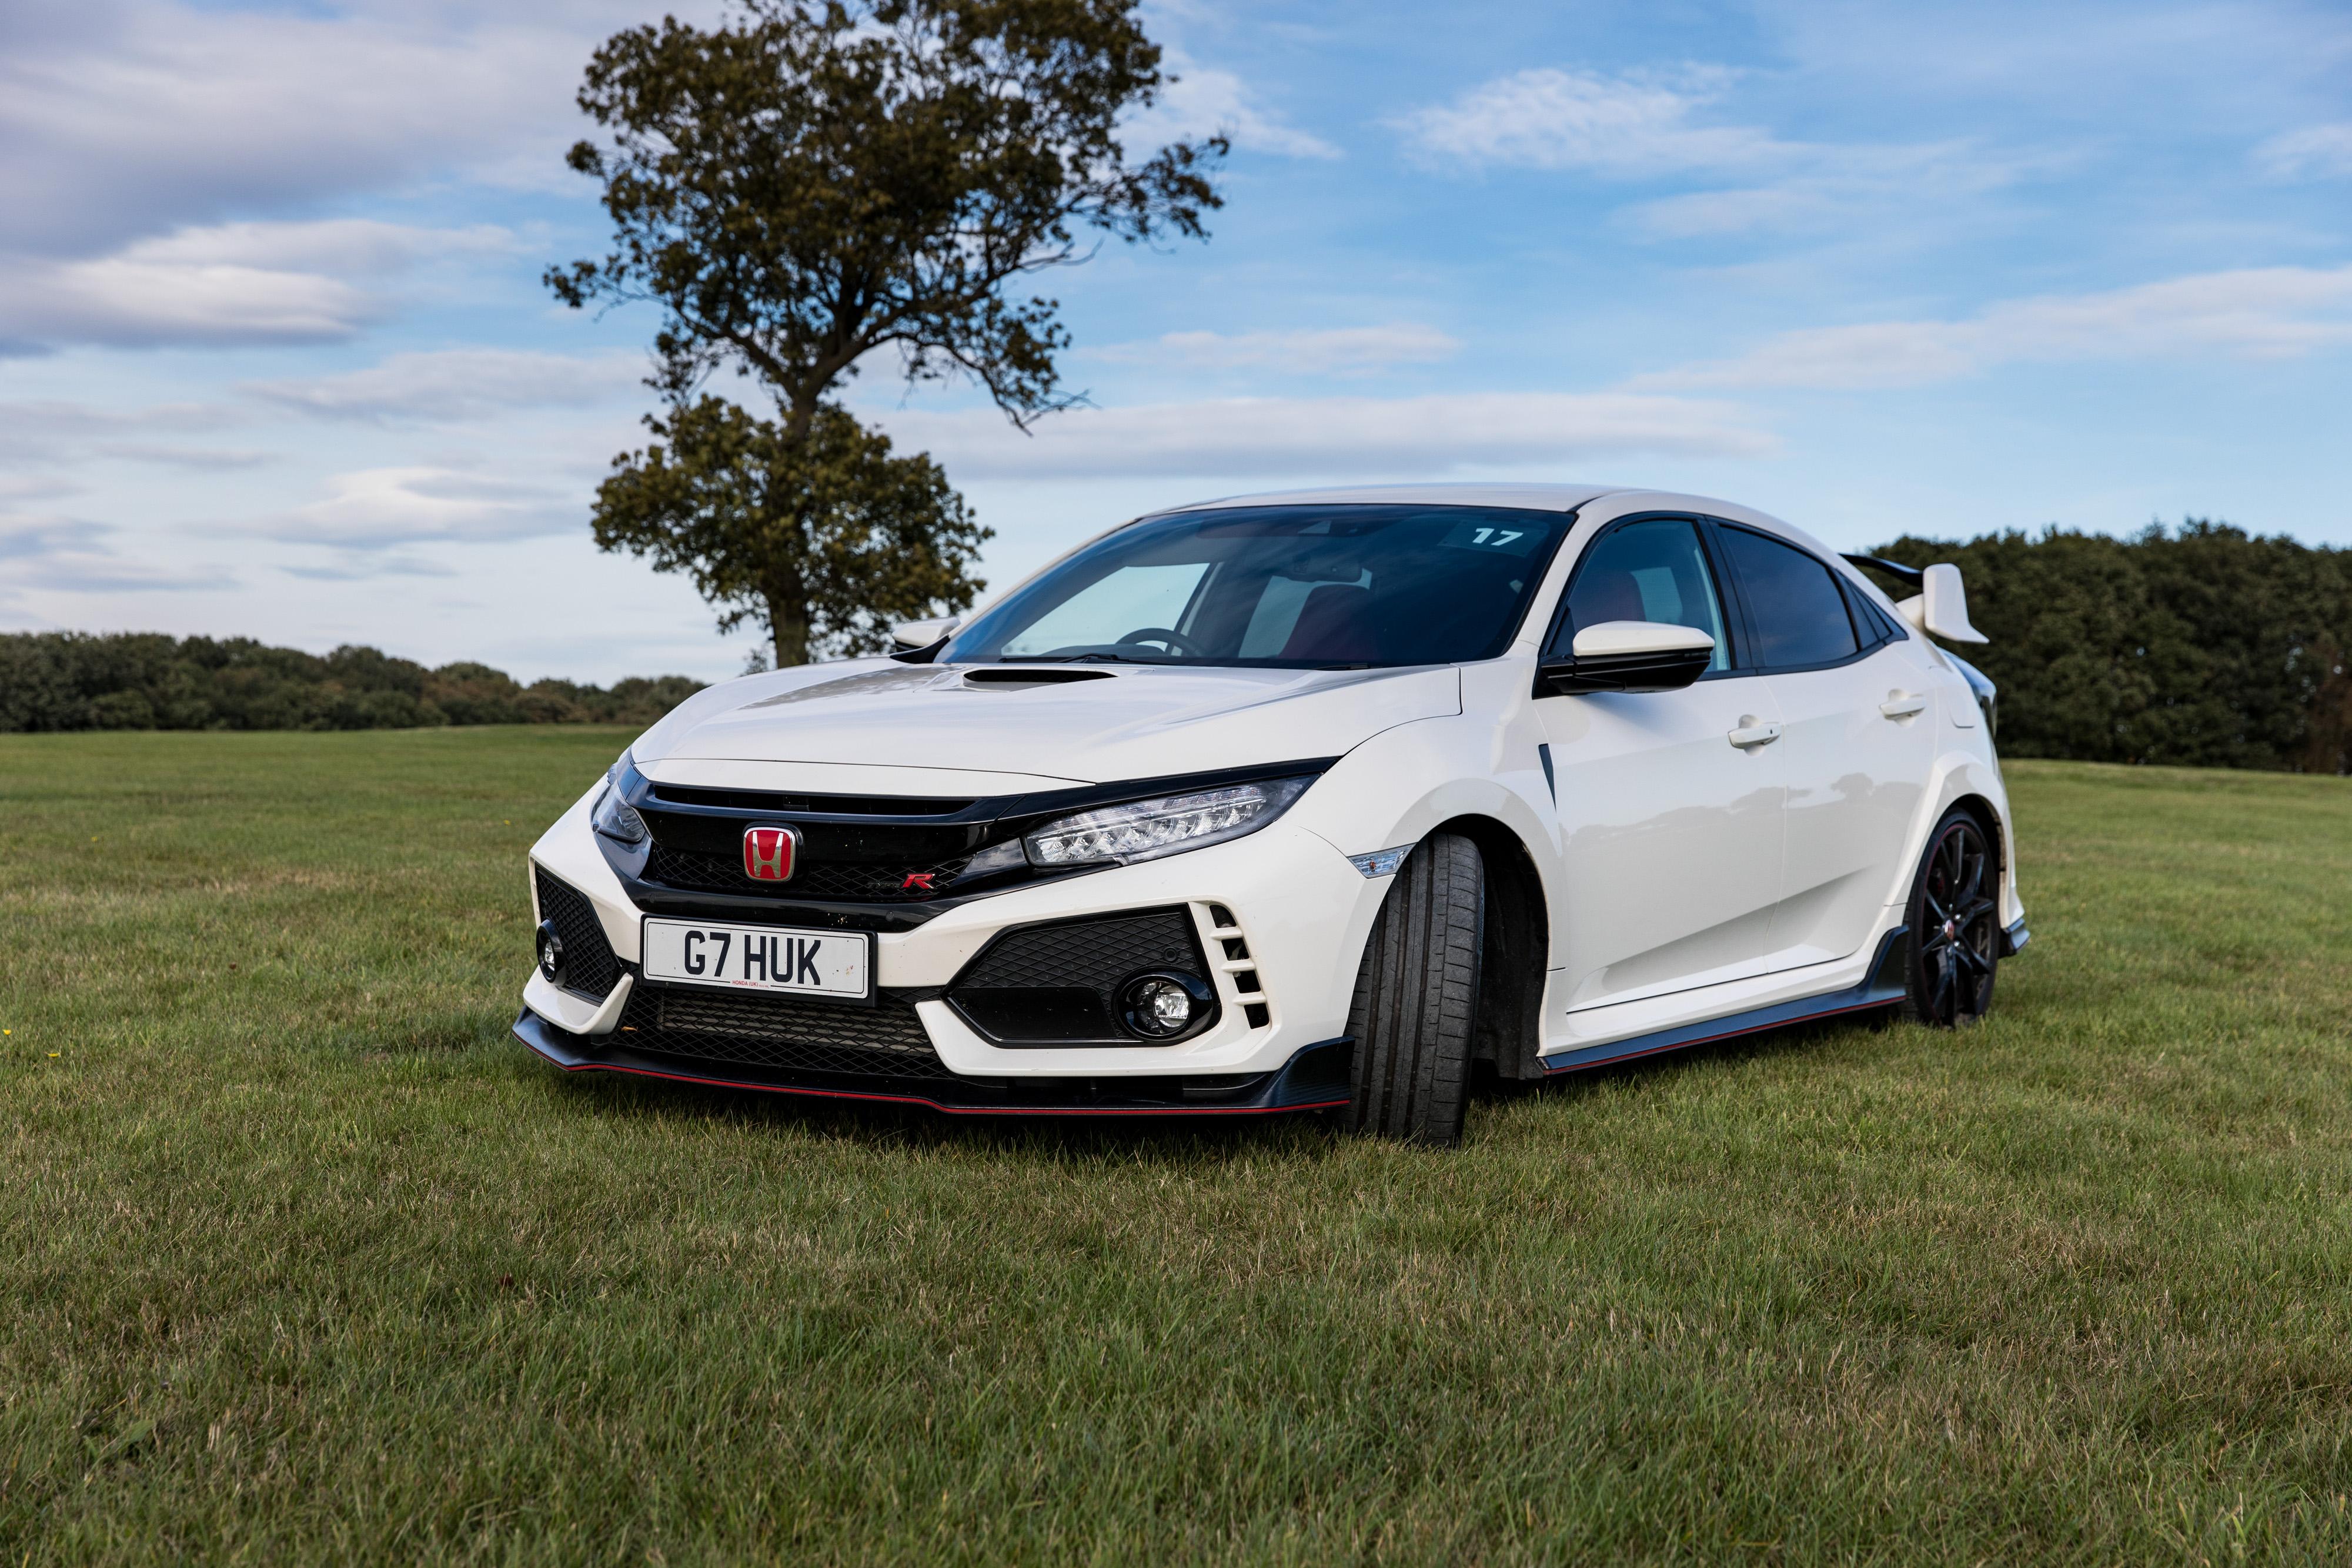 Honda Civic Type R - Flash Drive and Video